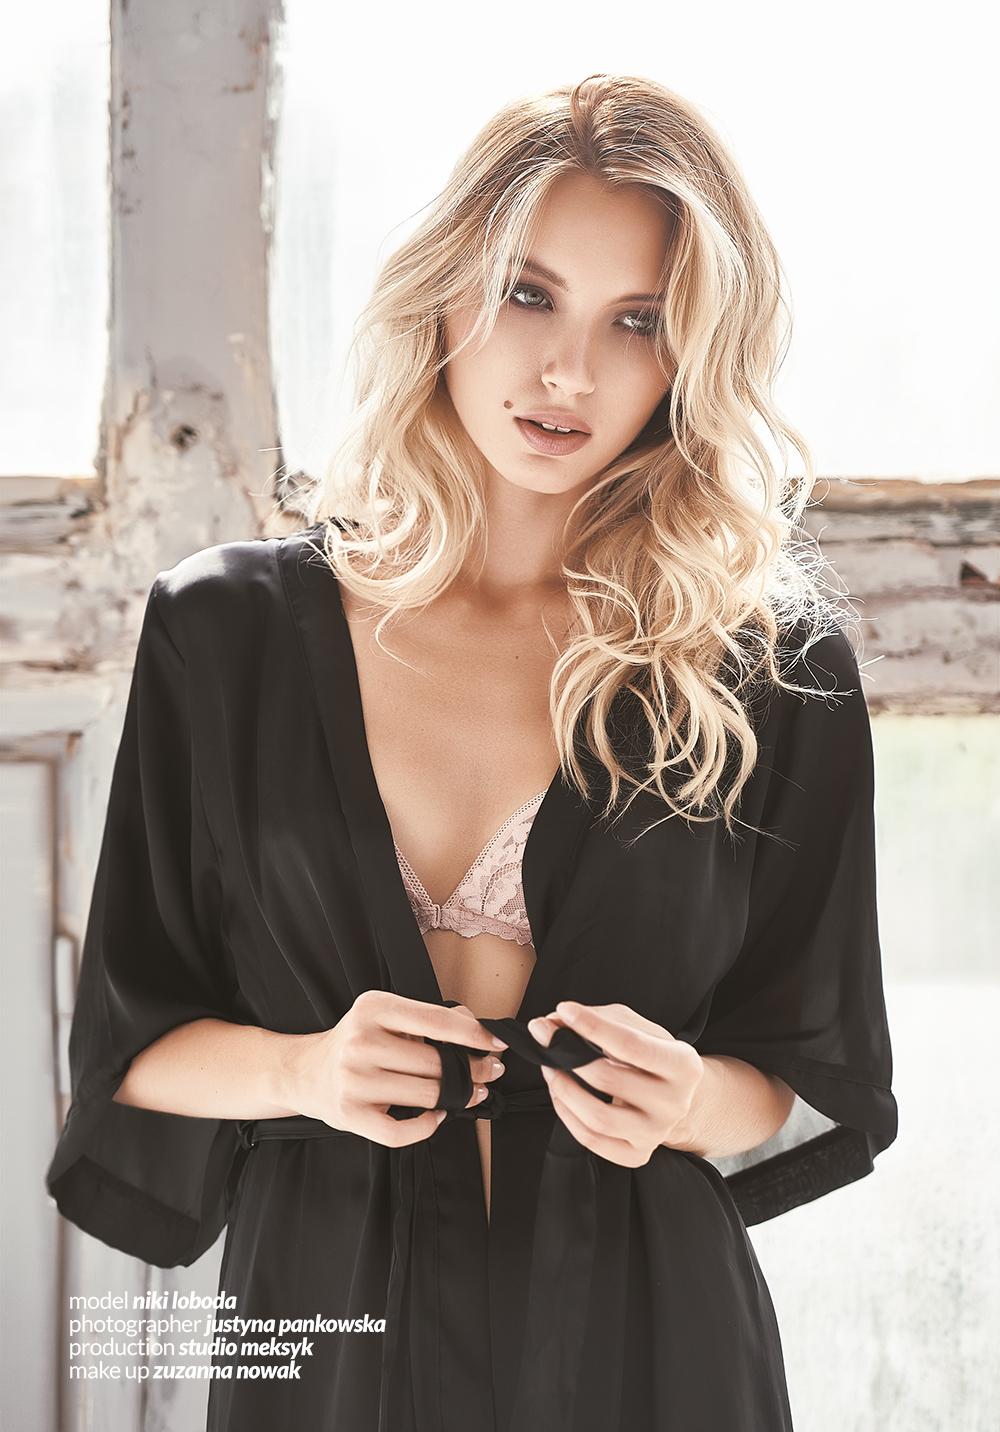 nikki, photo, model, photomodel, session, retouch, photography, portrait, shoot, fashion, magazine, press, sexy girl, blonde, beauty, woman, amazing, lingerie,3.jpg